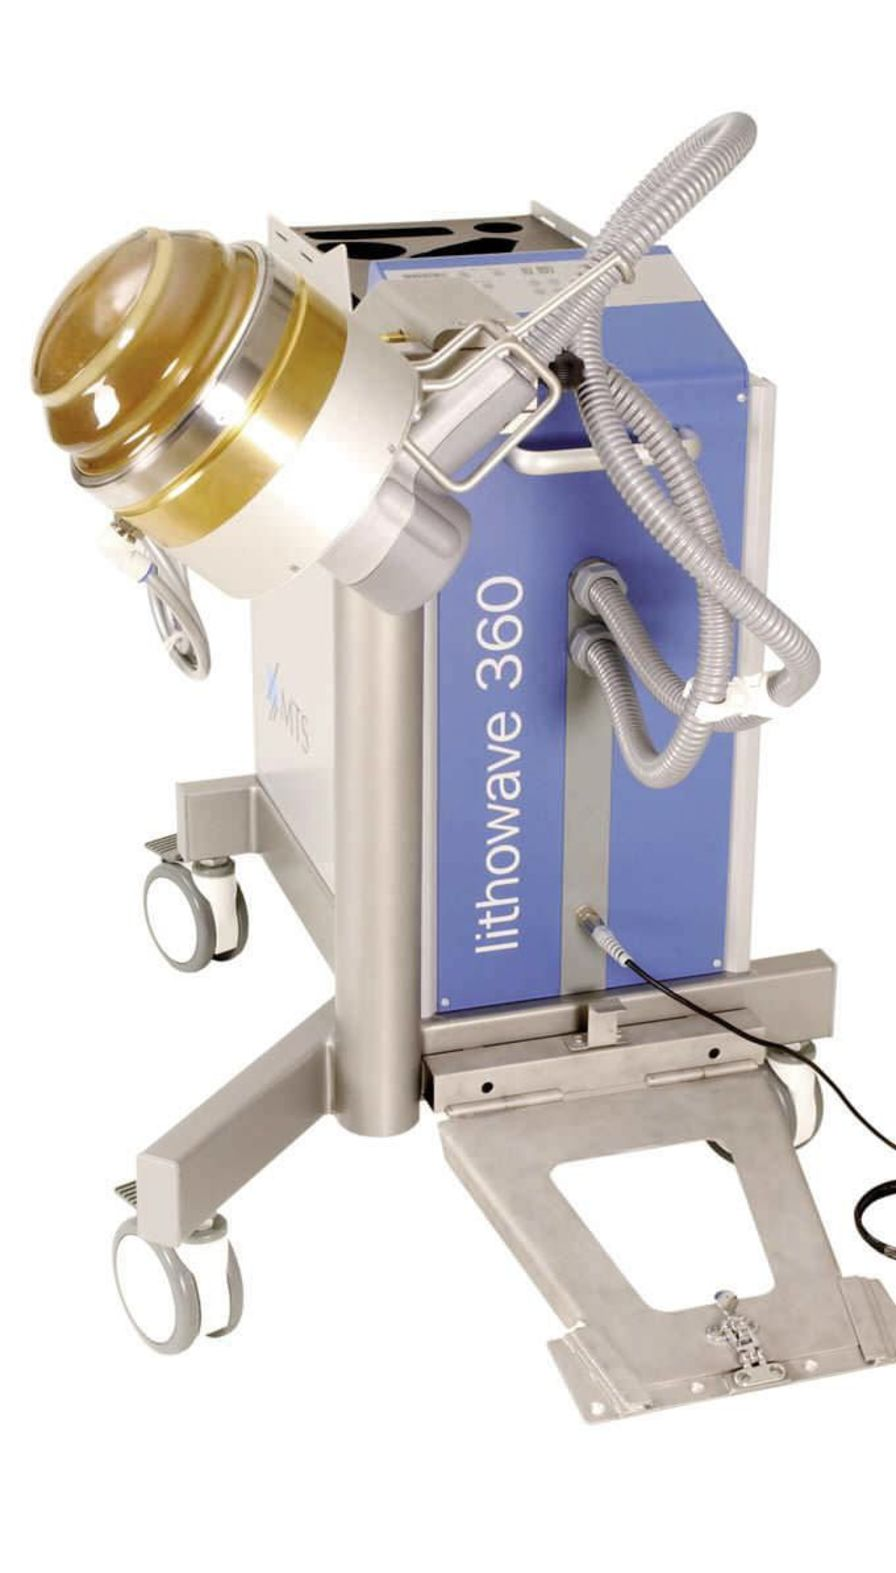 Extracorporeal lithotripter lithowave360 CS MTS Medical UG